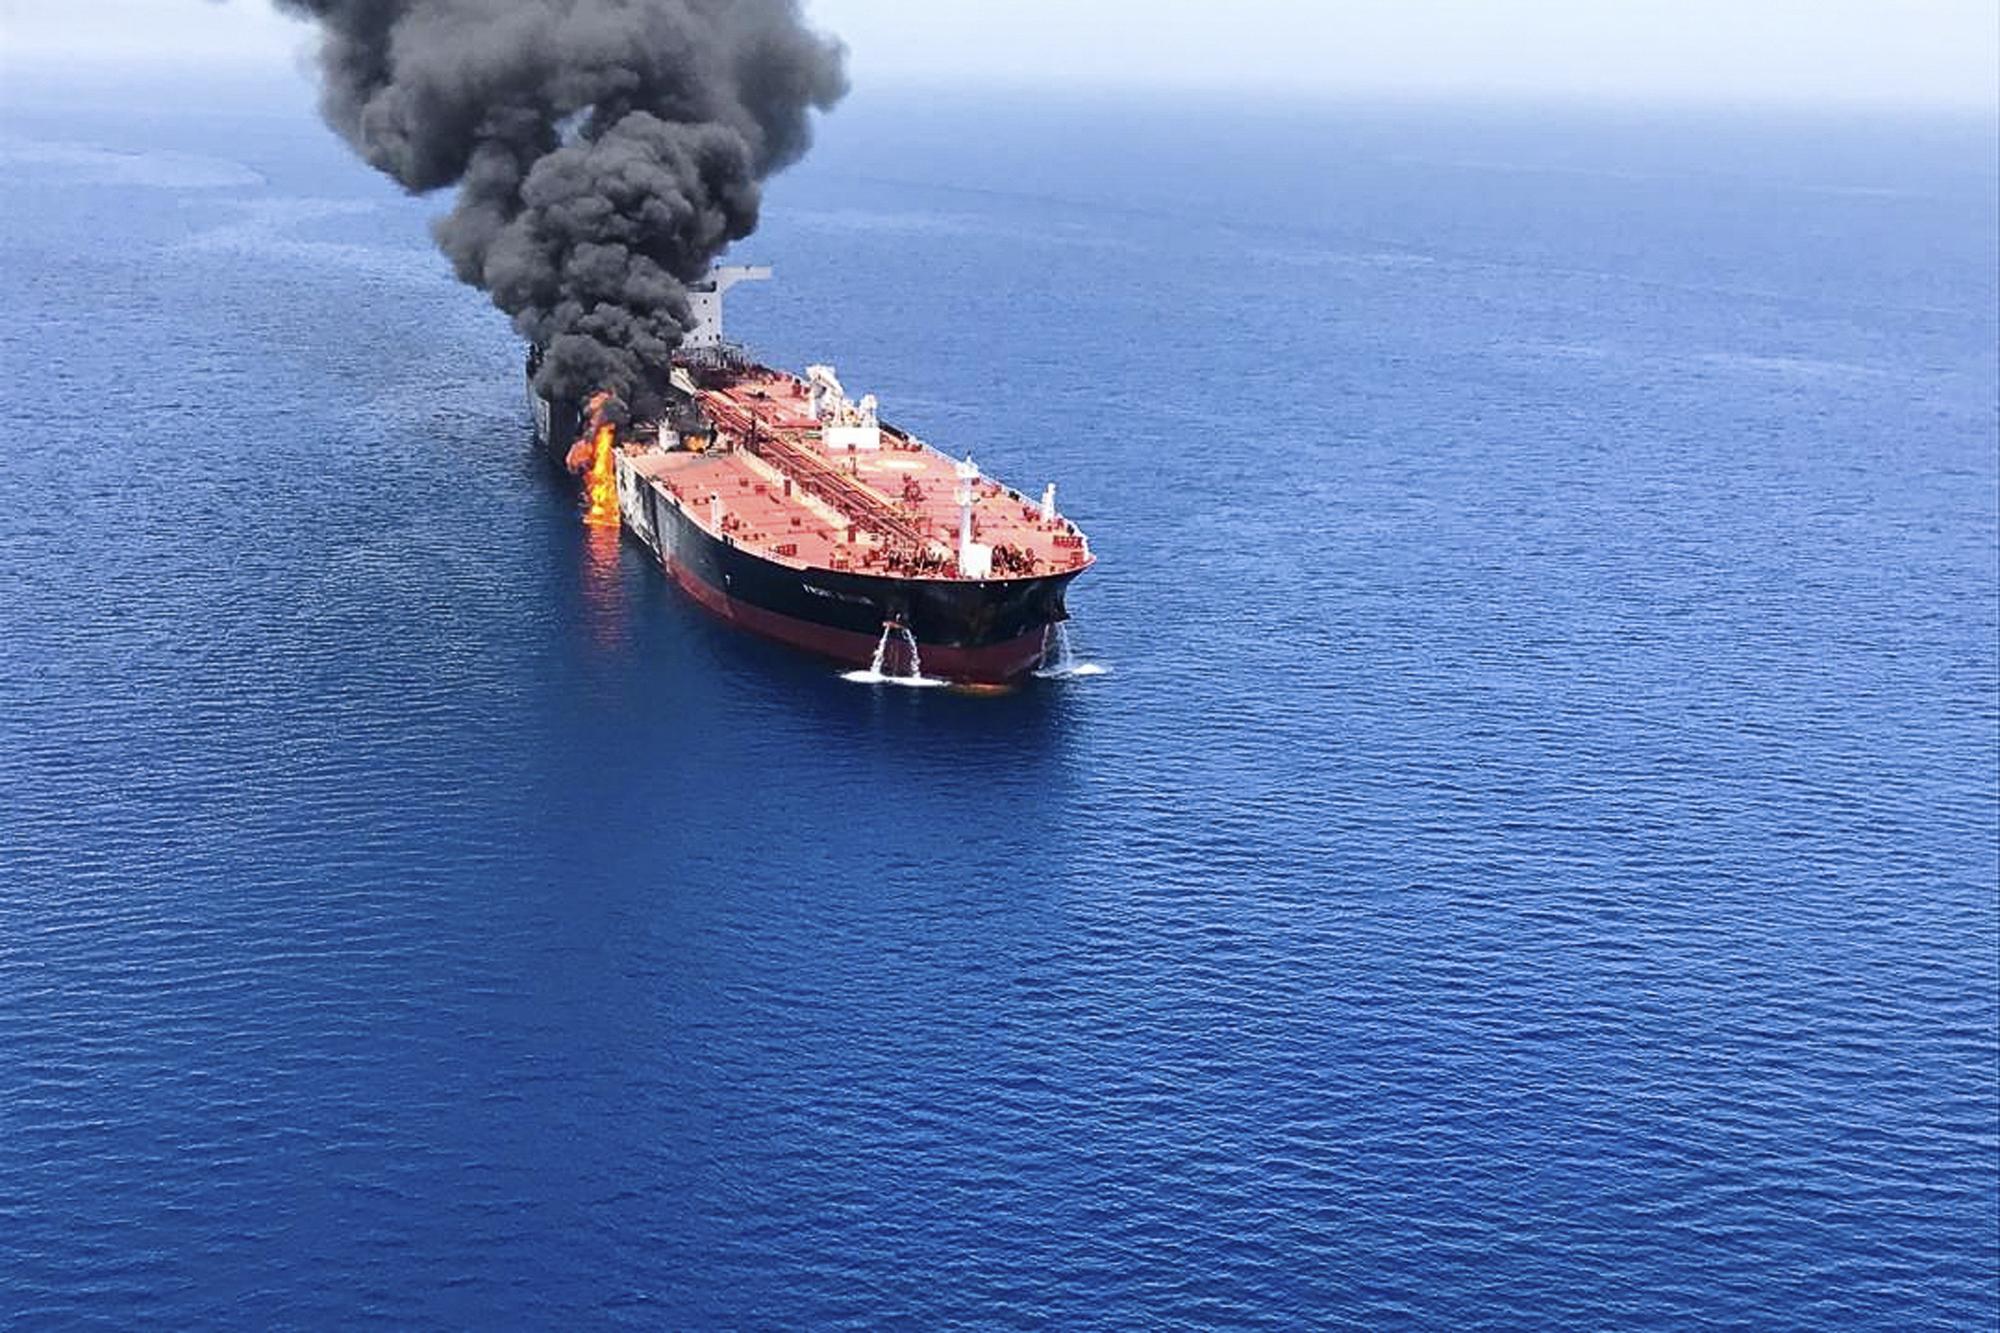 Iran_Persian_Gulf_Tensions_29009-159532.jpg16336701